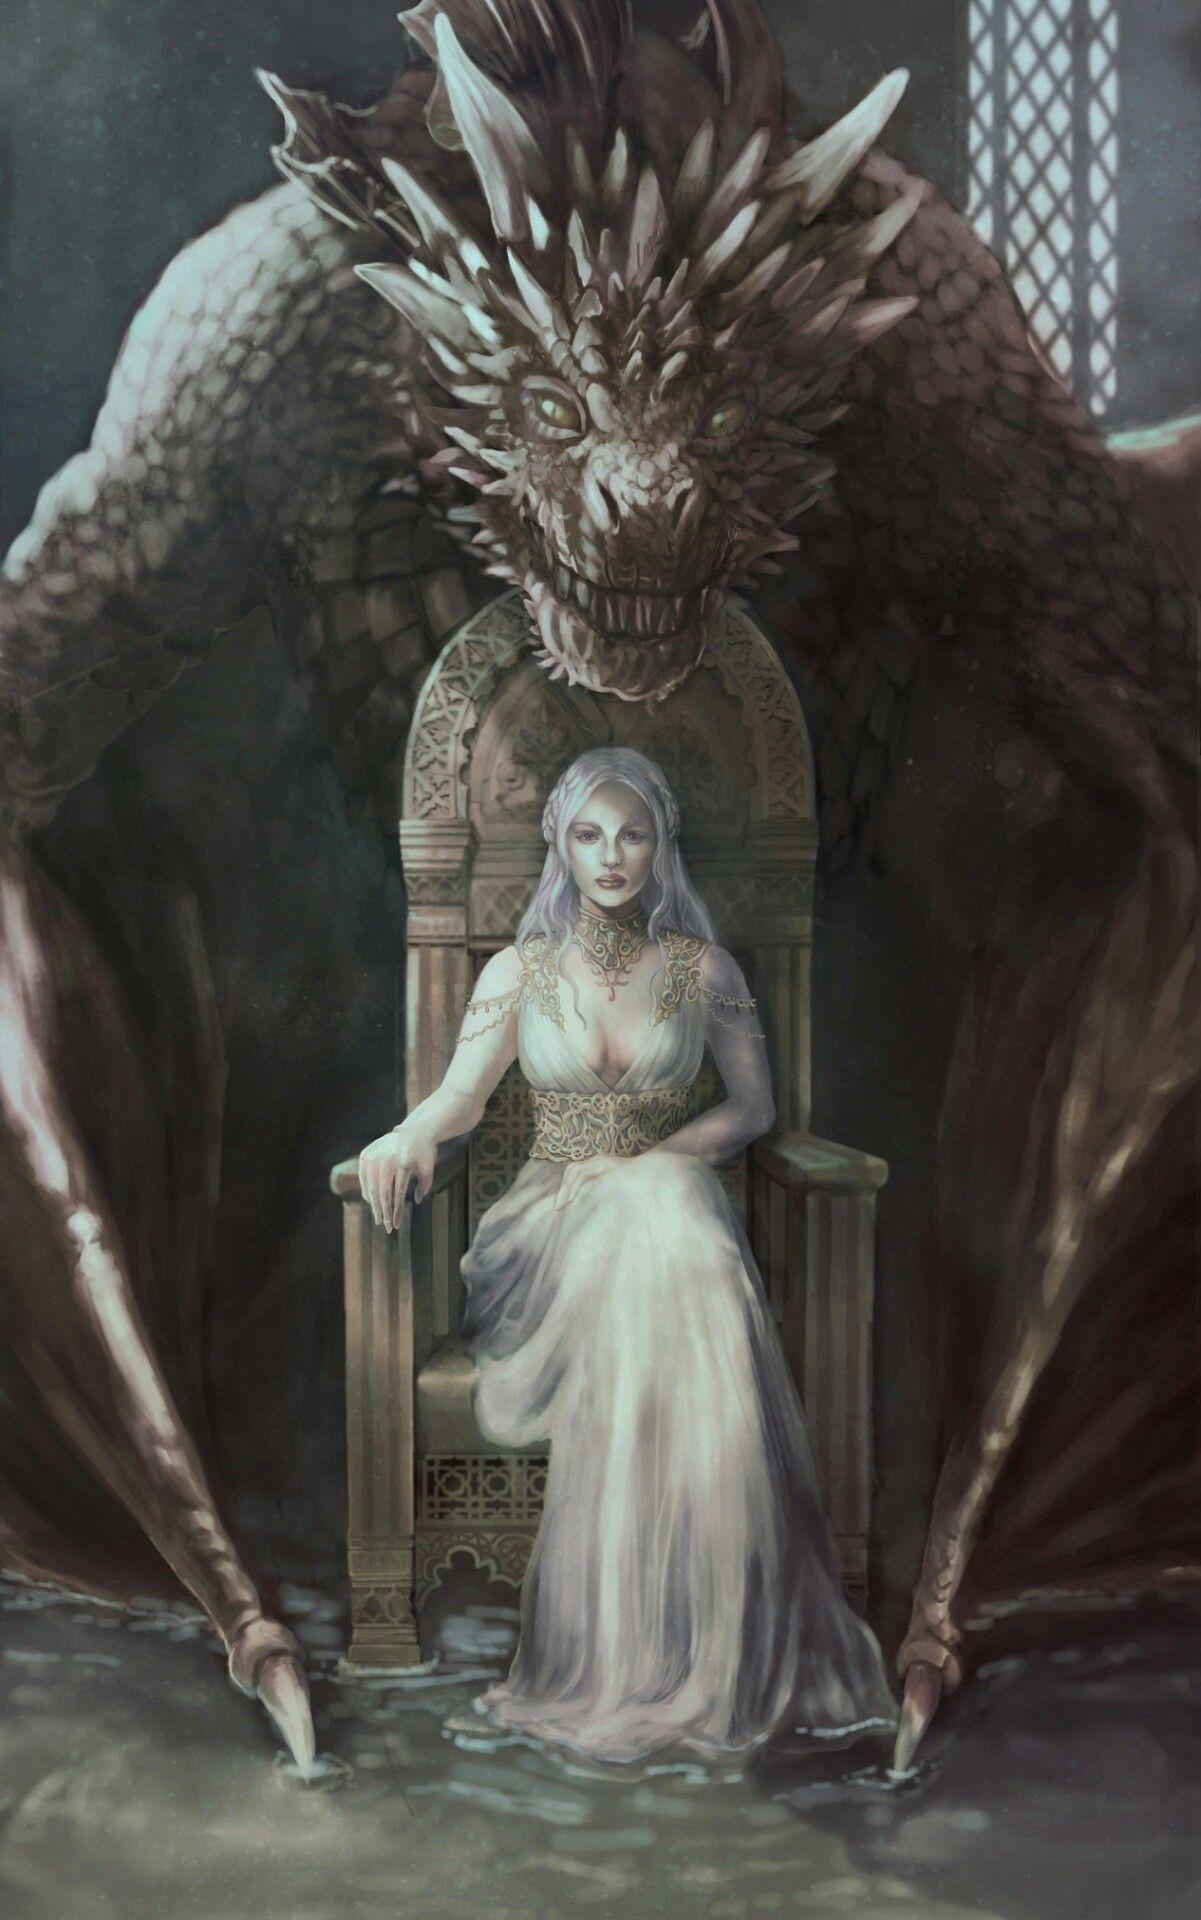 legenda game.of.thrones.s07e07.1080p. torrentcounter.cc